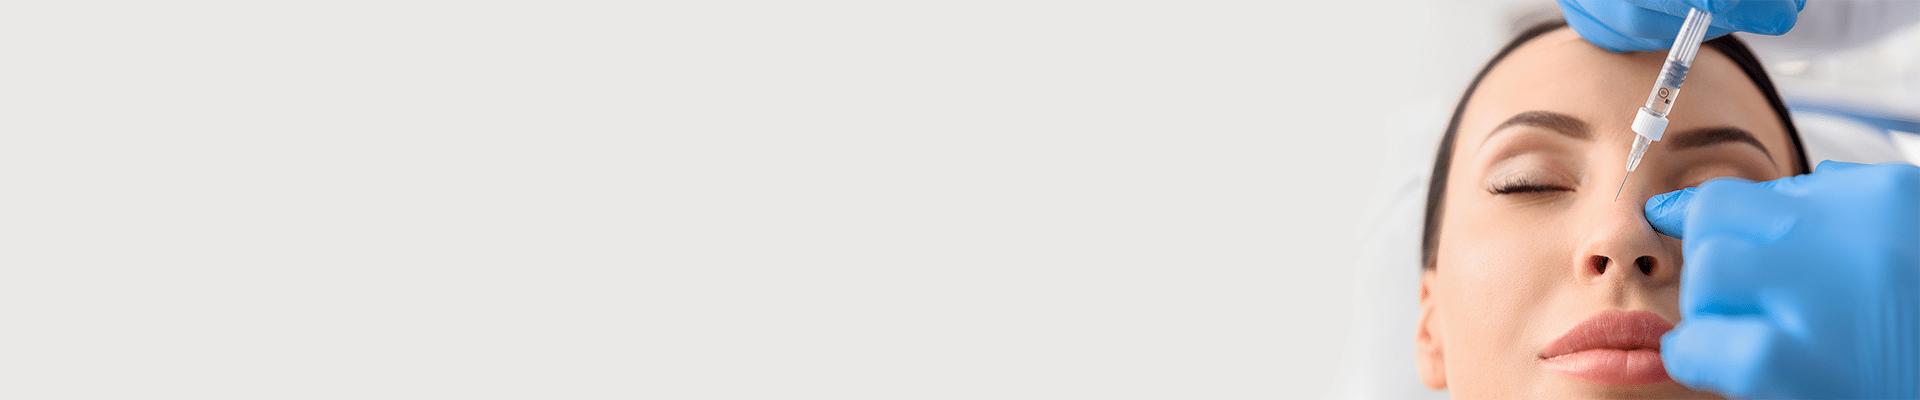 [:fr]Rhinoplastie médicale Nabeul ou rhino modulation, Rhinoplastie sans chirurgie[:ar]تجميل الأنف الطبي في نابل أو تعديل وحيد القرن ، تجميل الأنف دون جراحة :[:]